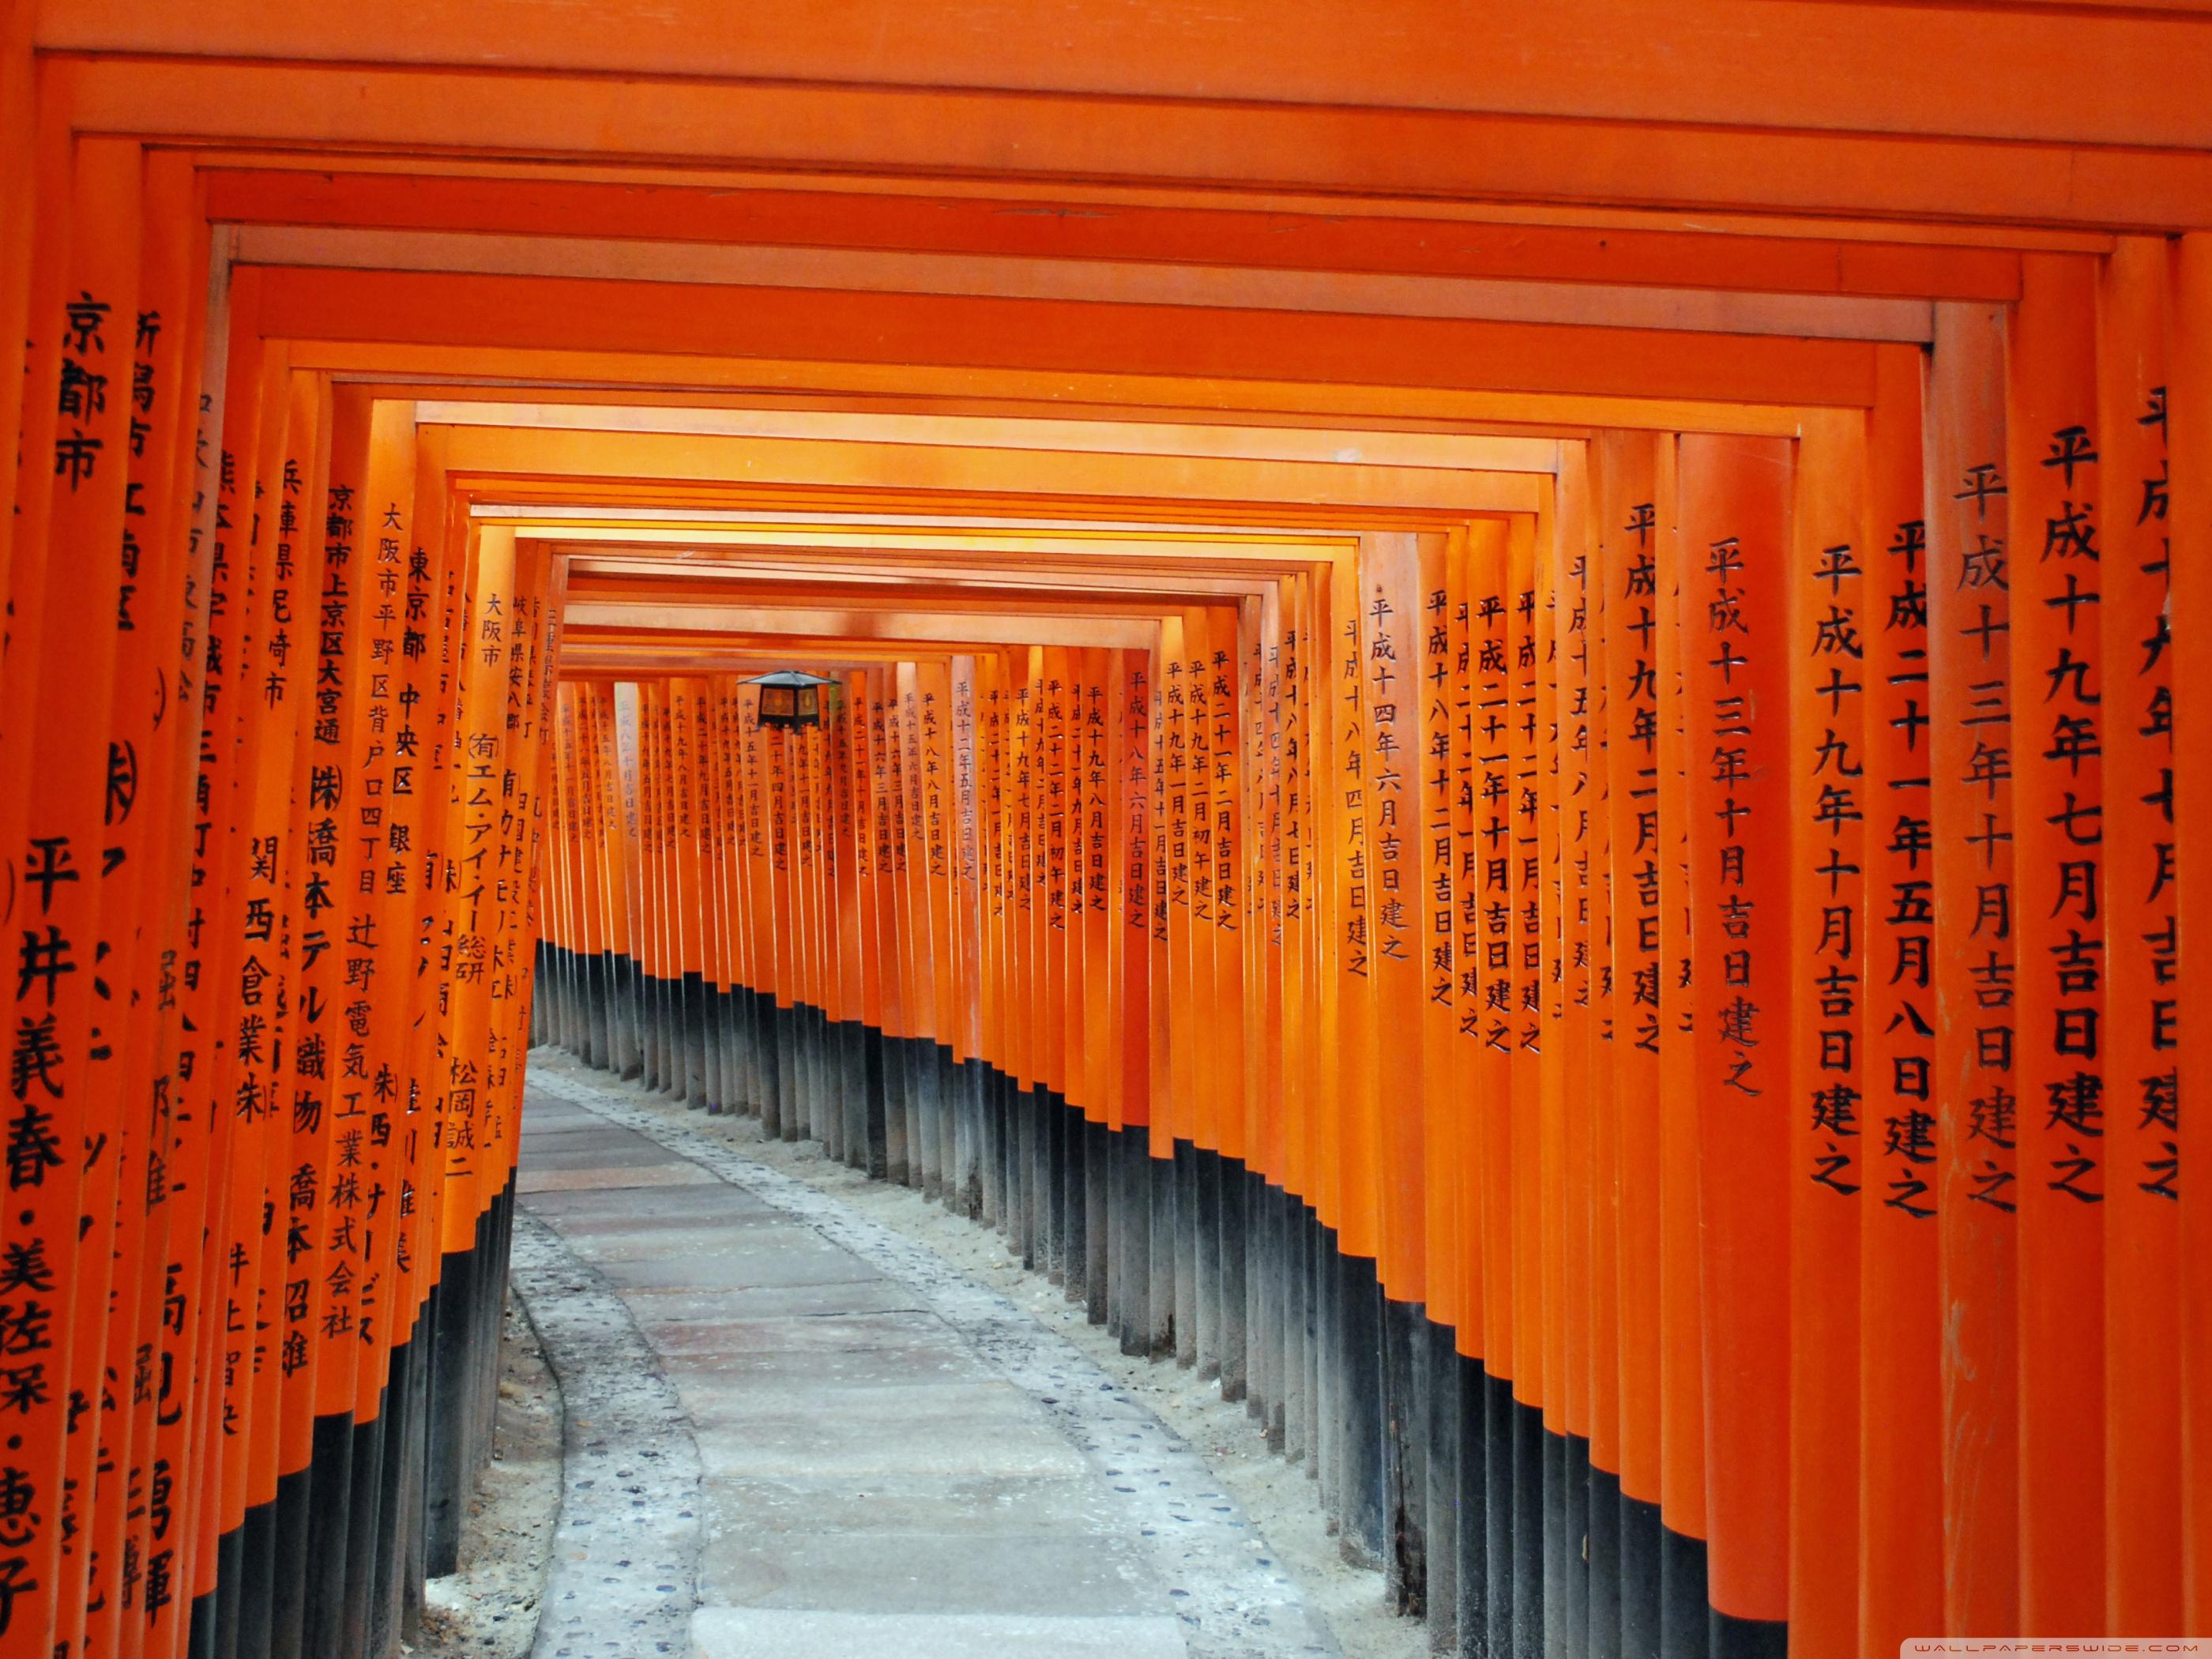 Fushimi Inari Taisha Kyoto Japan 4K HD Desktop Wallpaper for 2800x2100